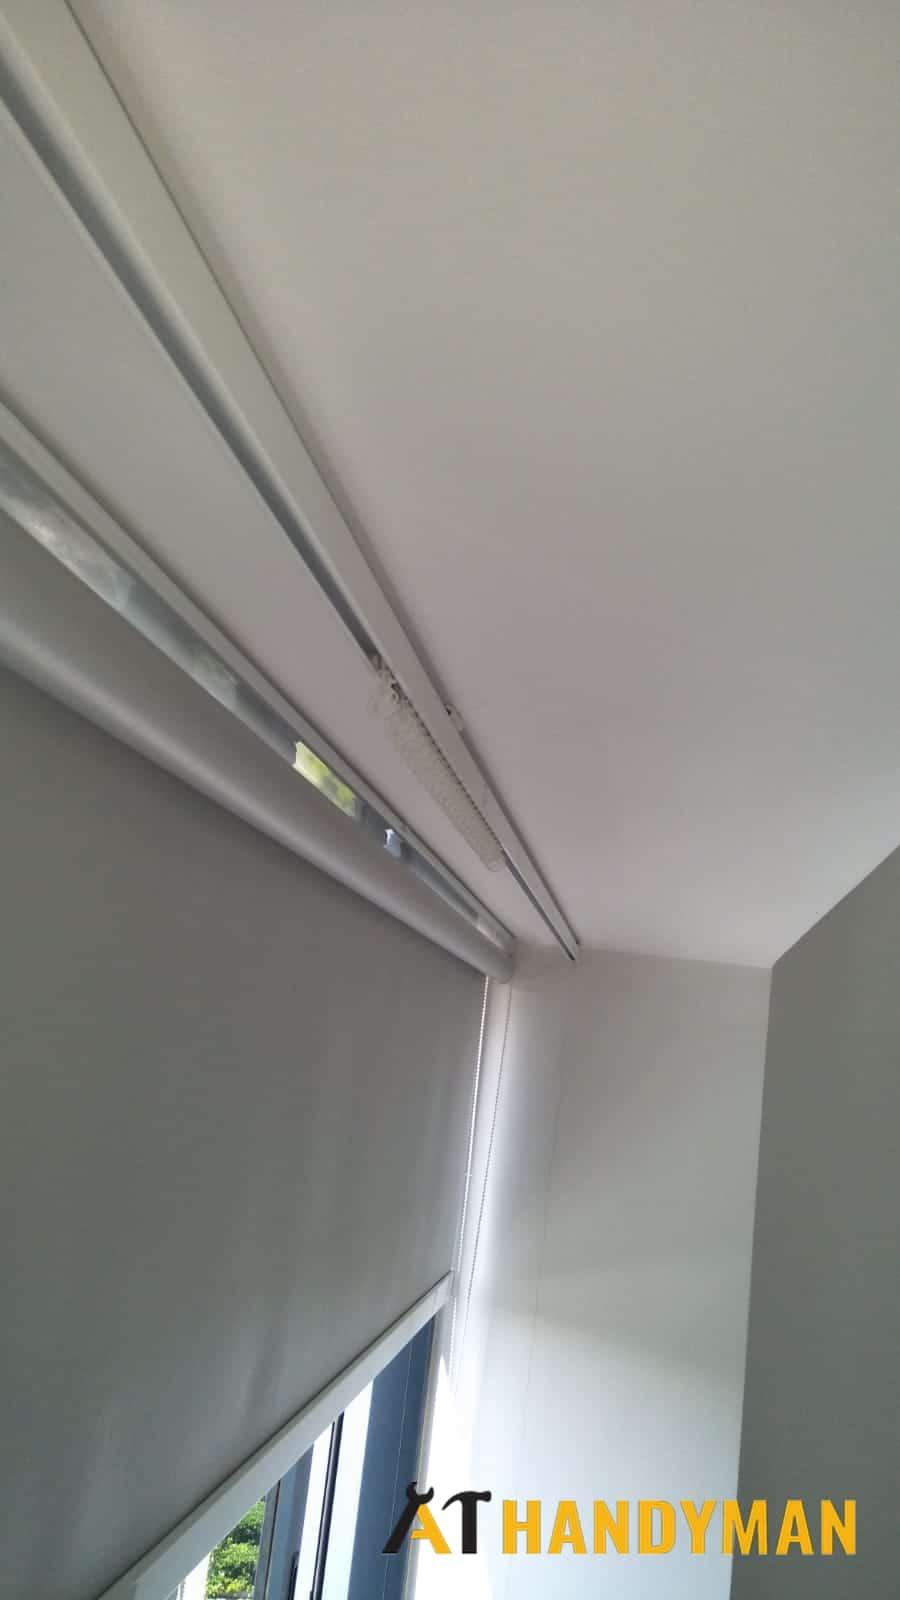 curtain-track-installation-drilling-services-a1-handyman-singapore-condo-redhill-2_wm